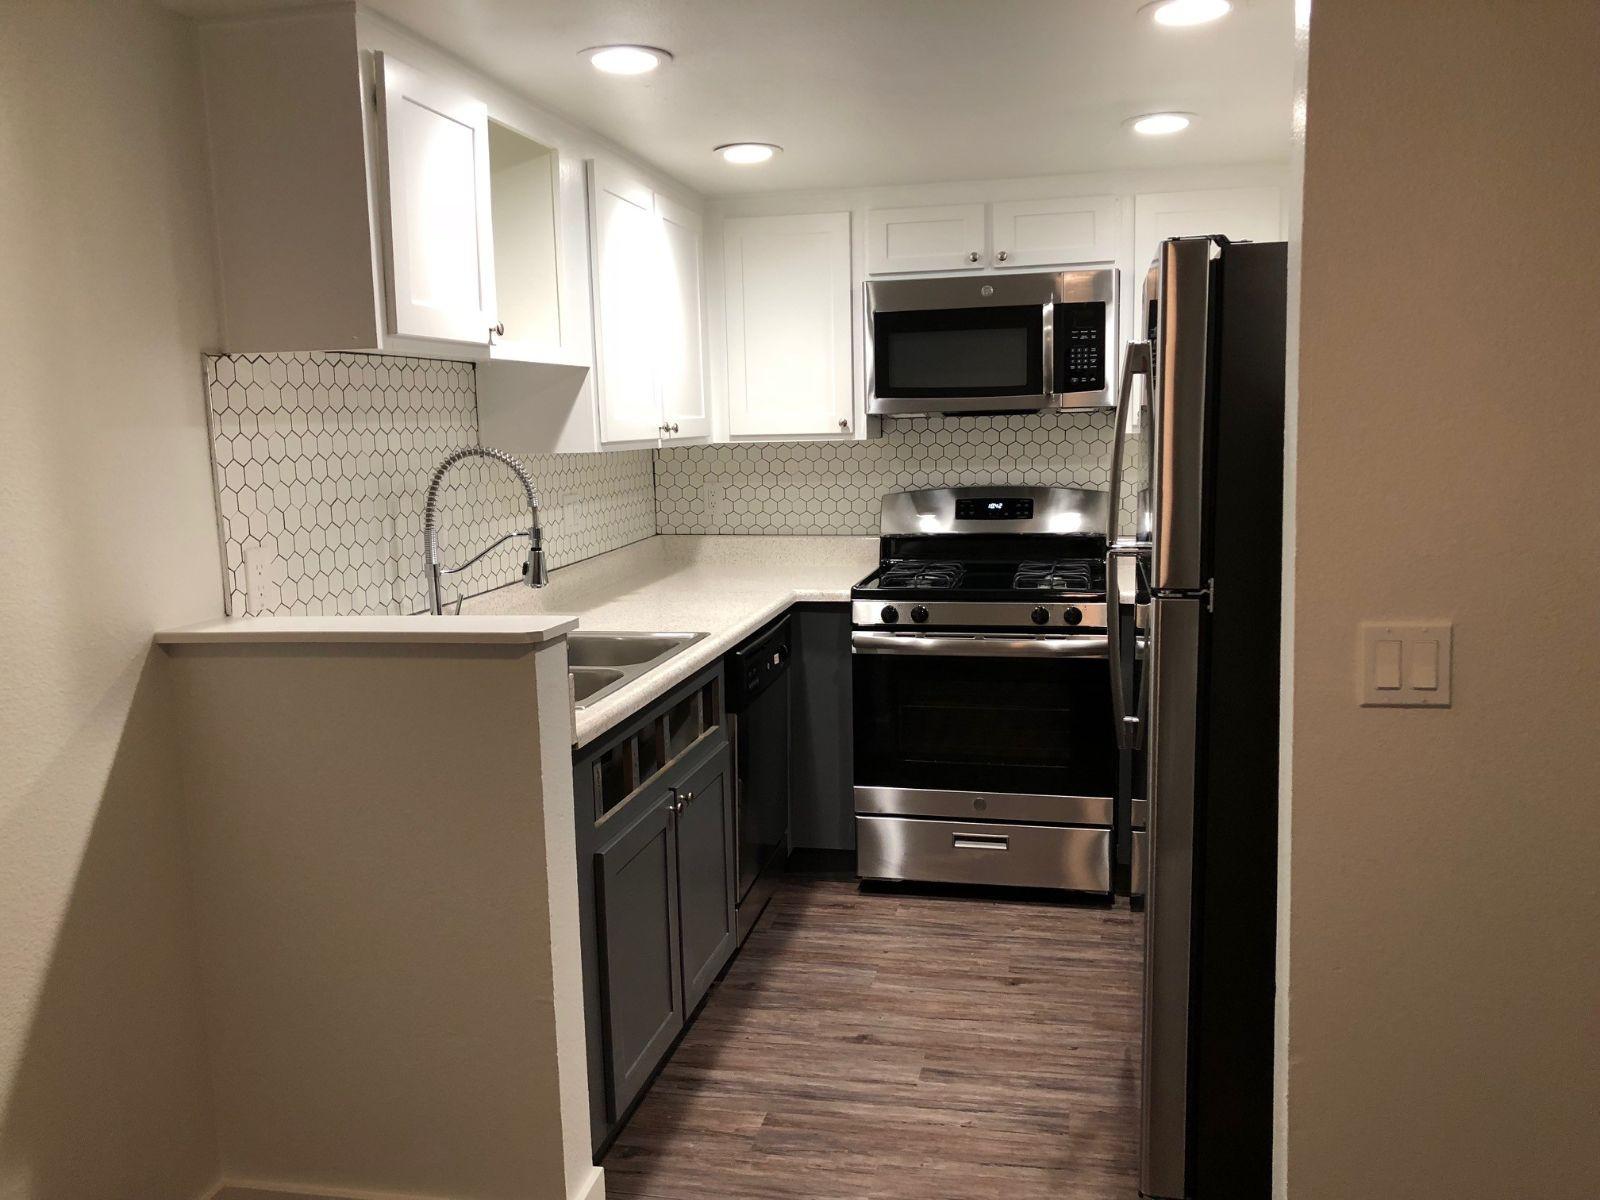 Apartments Near LLU Ironwood Villas for Loma Linda University Students in Loma Linda, CA